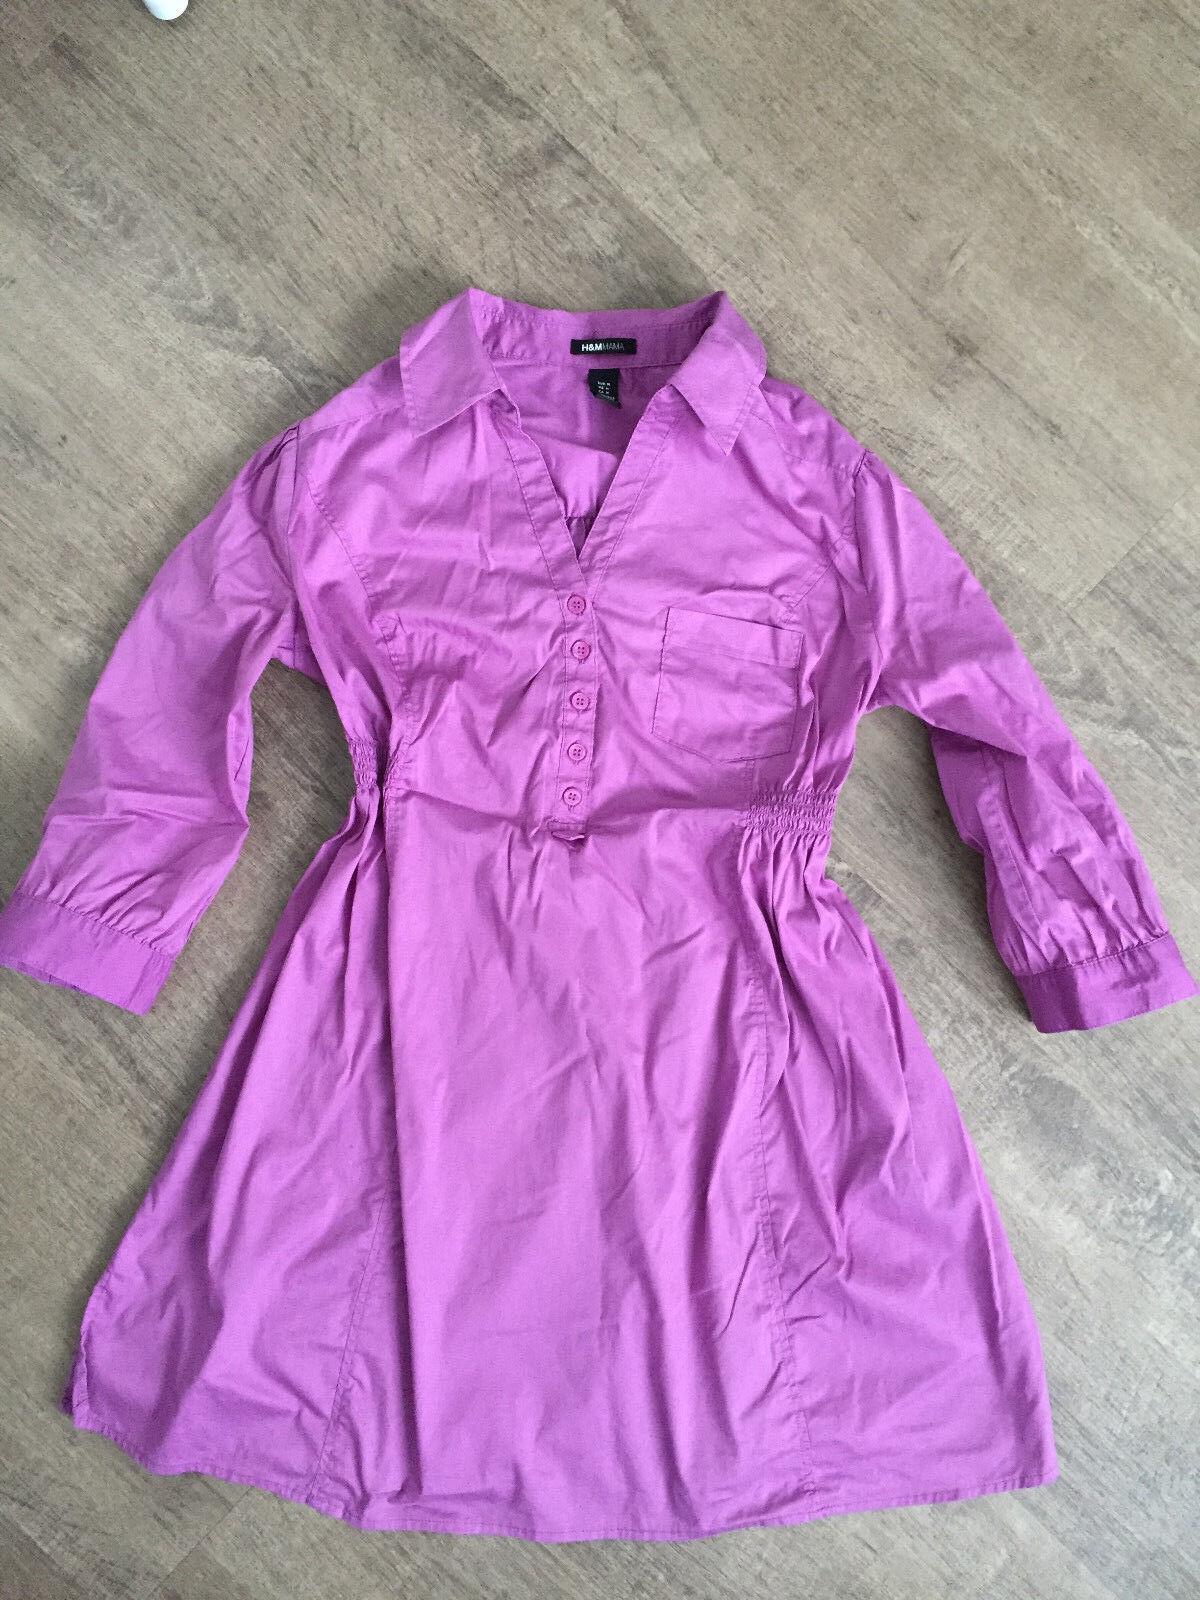 "Schwangerschaftskleidung Longbluse/Kleid  Pink Gr. 36 ""H&M"""